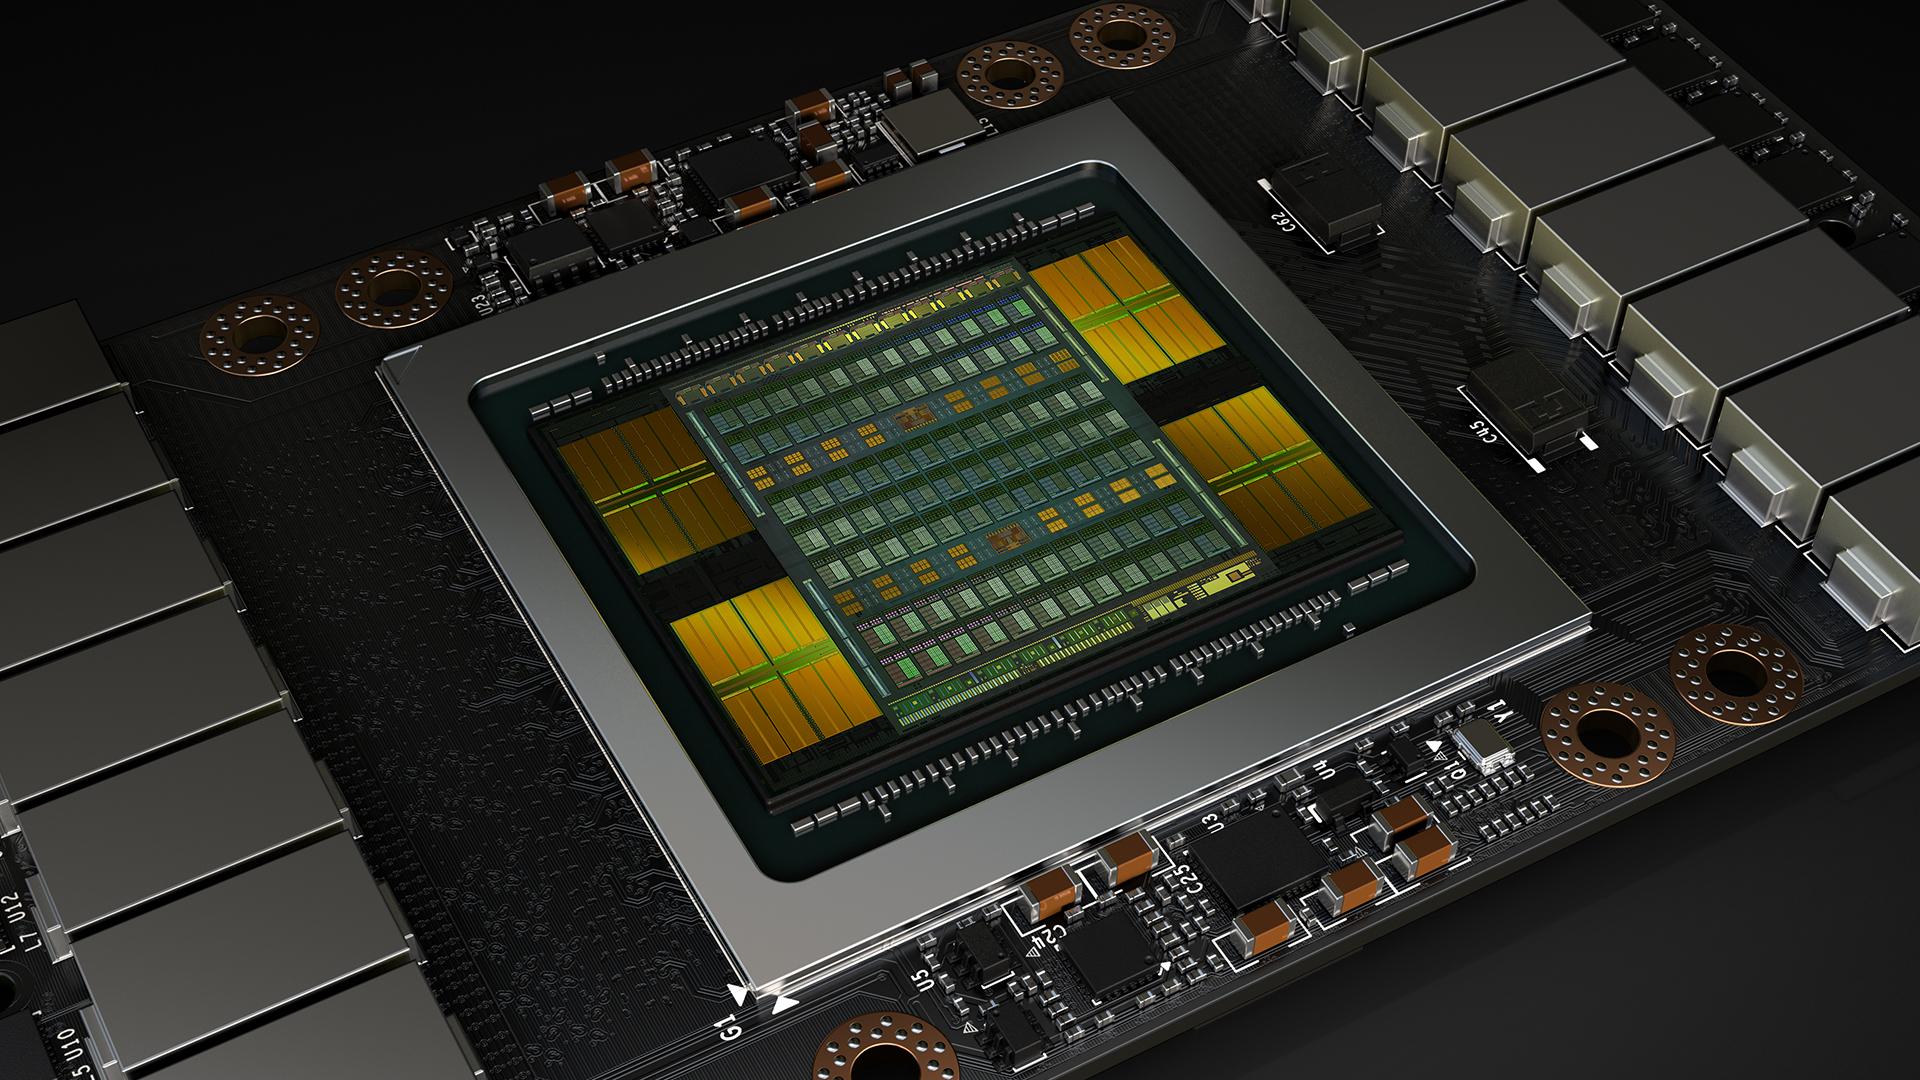 Image showing NVIDIA Telsa V100 data center GPU.